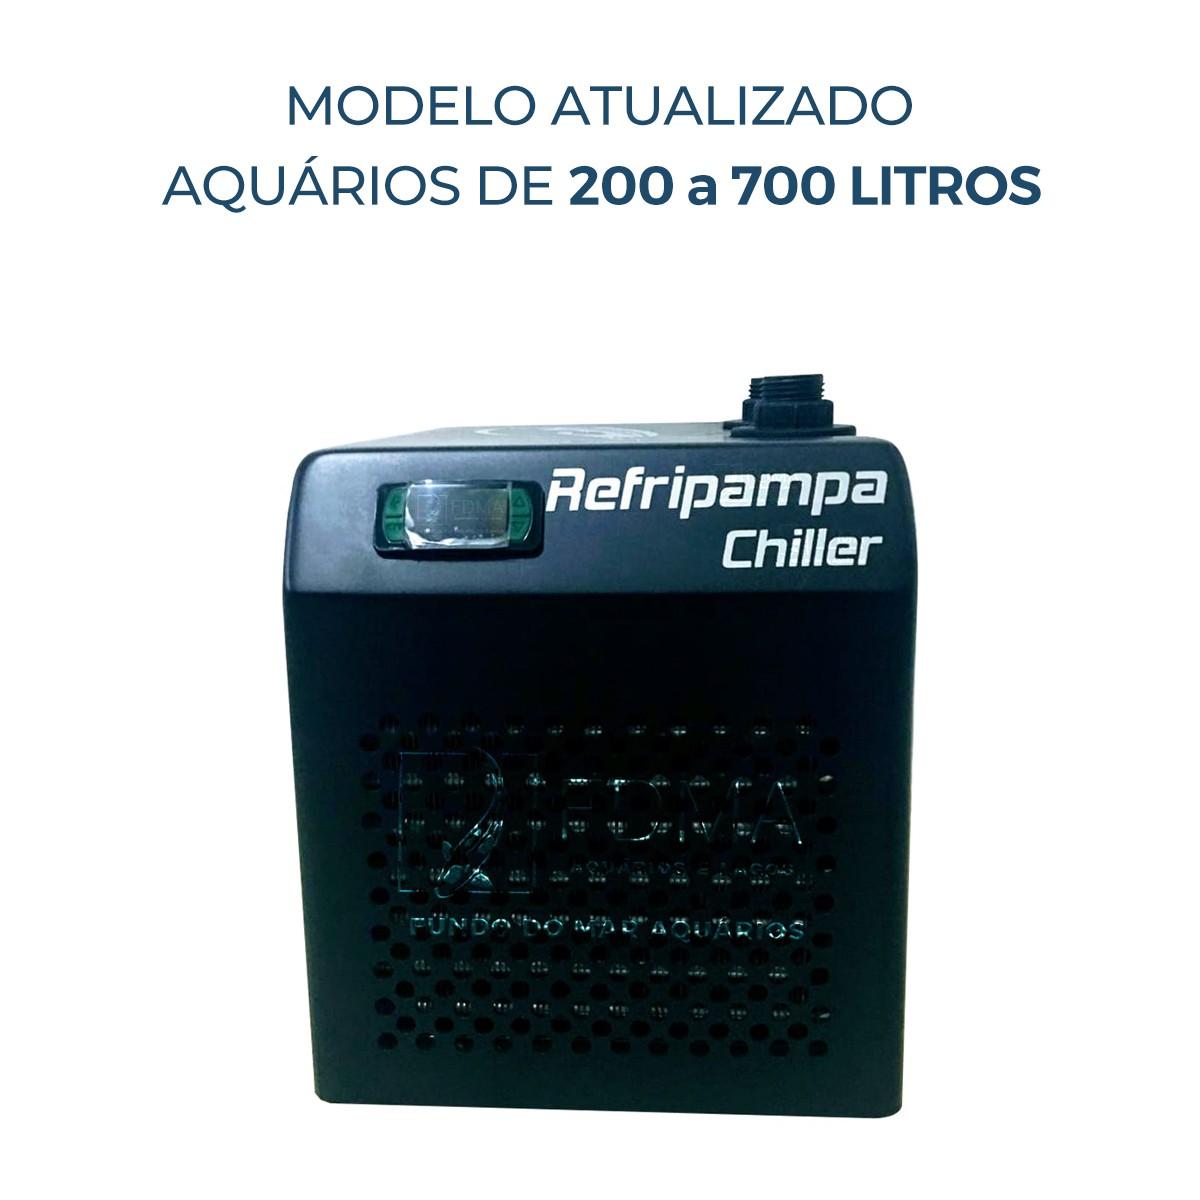 Resfriador Chiller Refripampa 1/5+ Hp RF700 - Aquários 700lL